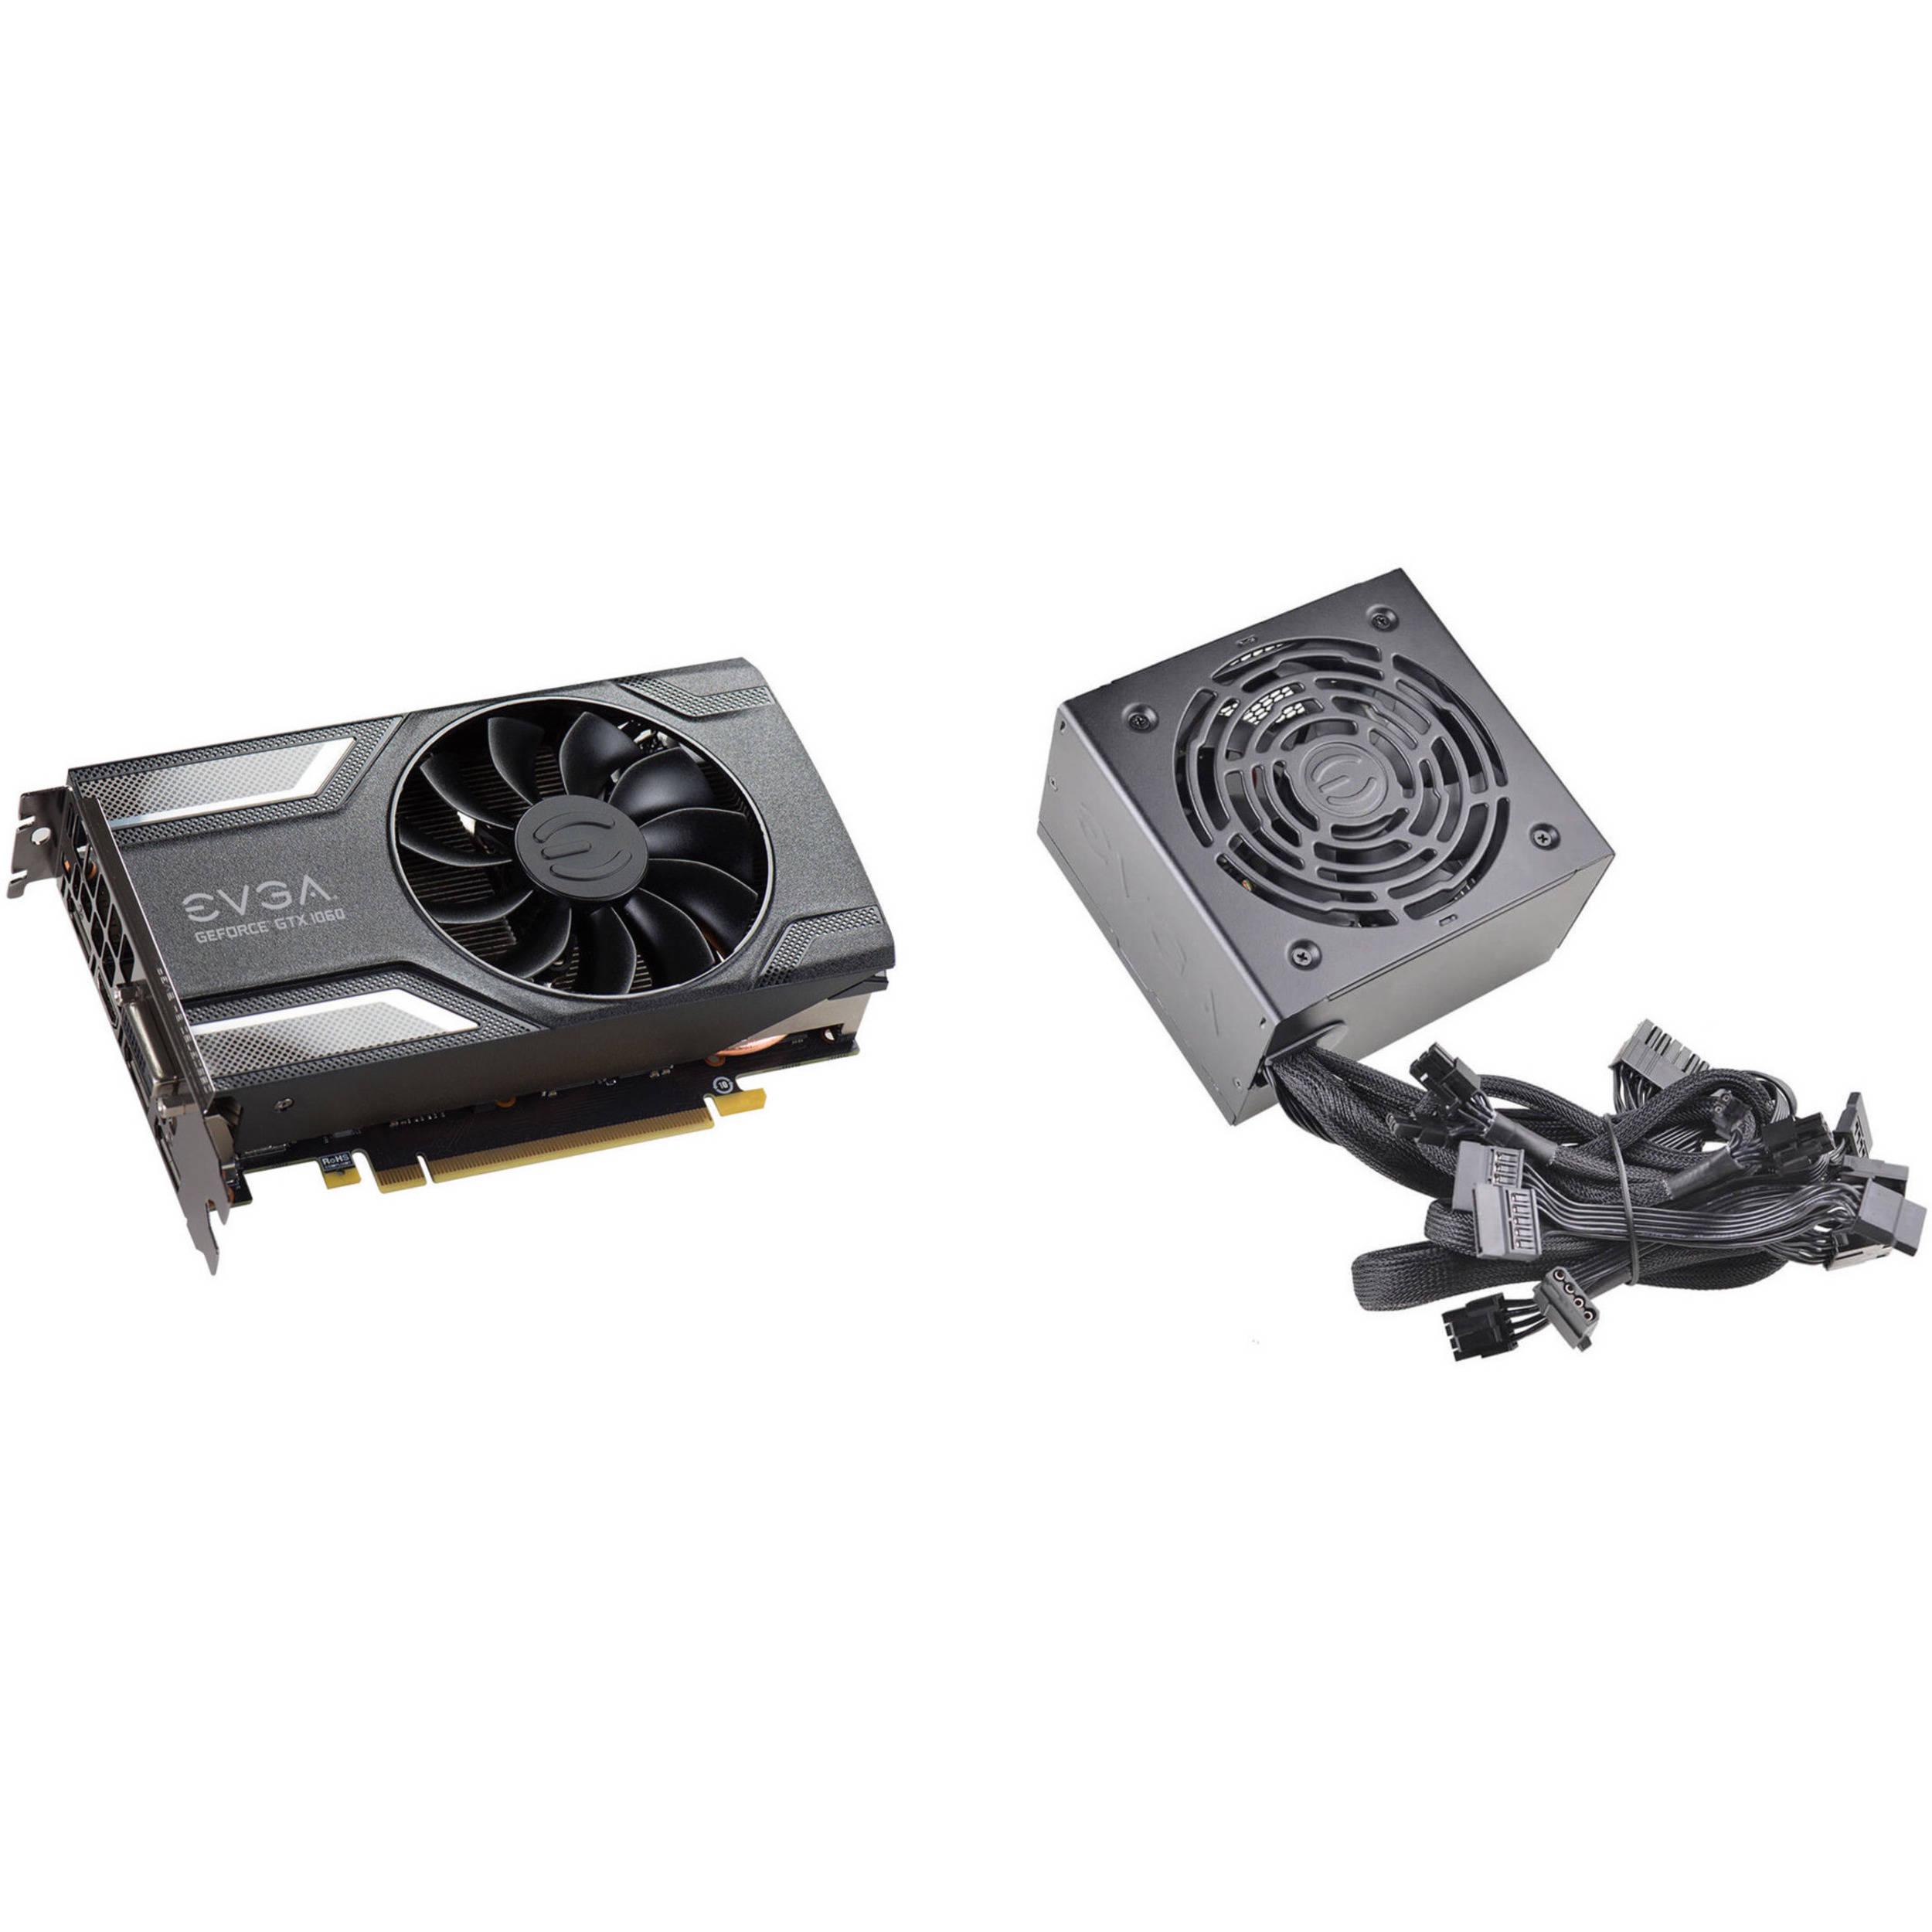 EVGA GeForce GTX 1060 SC GAMING Graphics Card & 600 BR 600W 80 Plus Bronze  Power Supply Kit